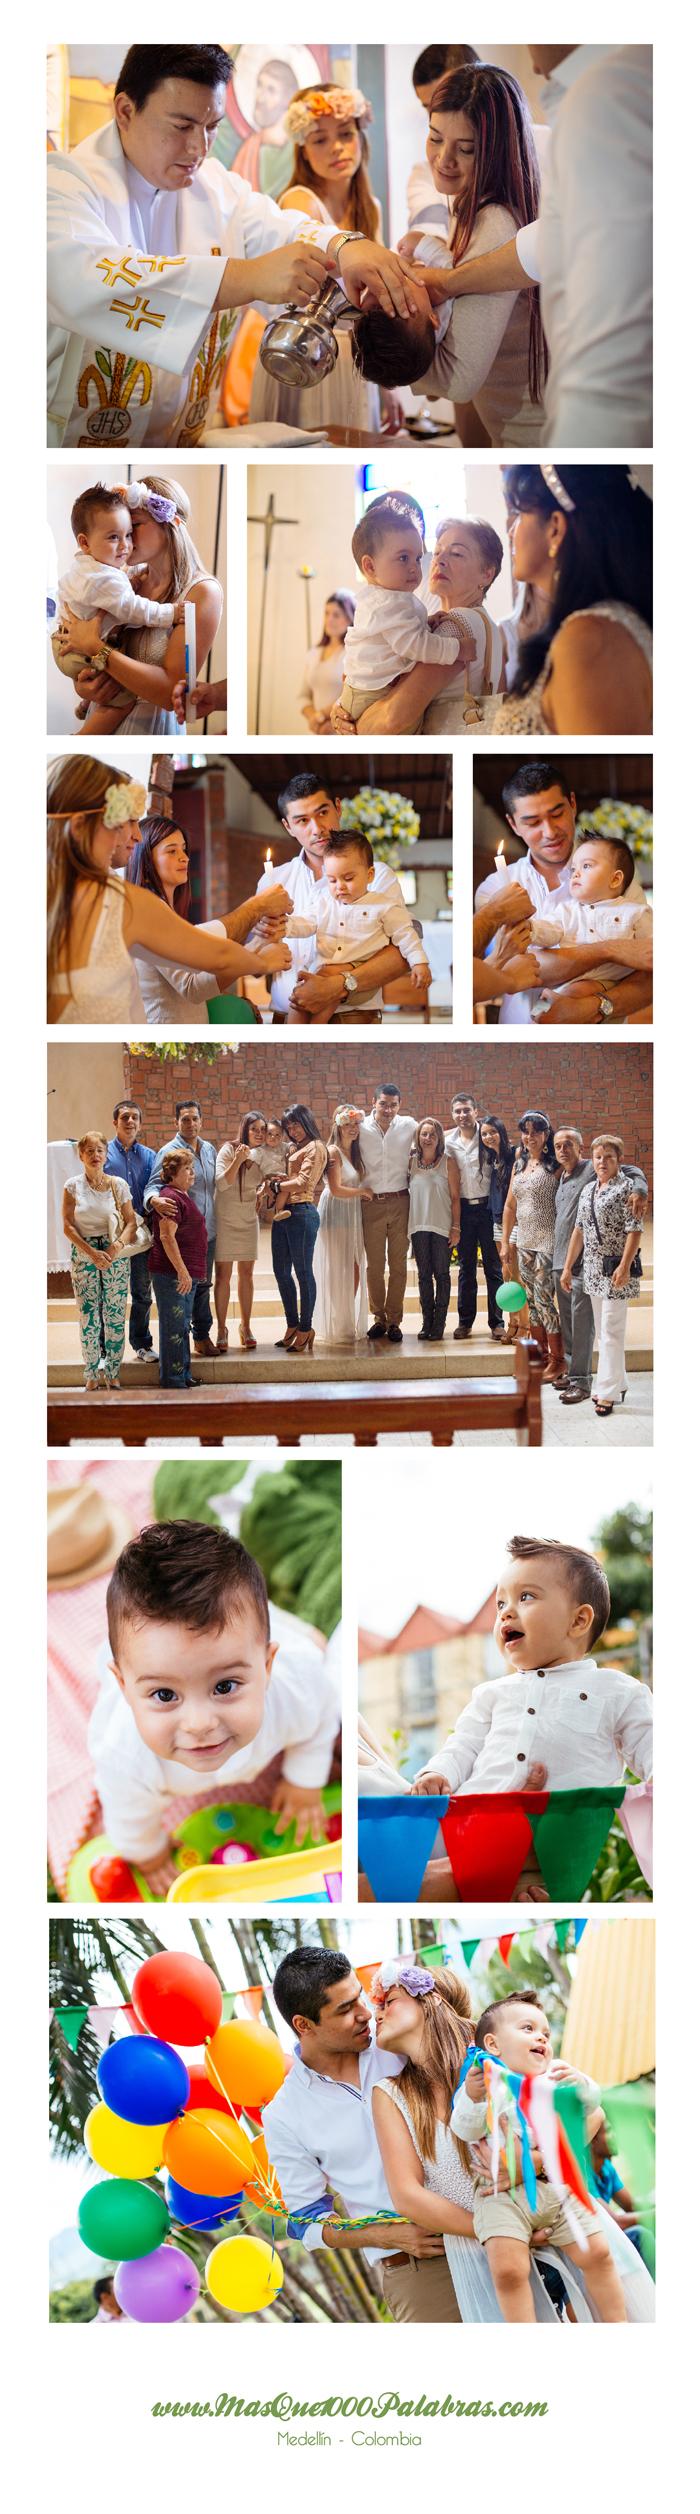 bautizo fotografia envigado masque1000palabras